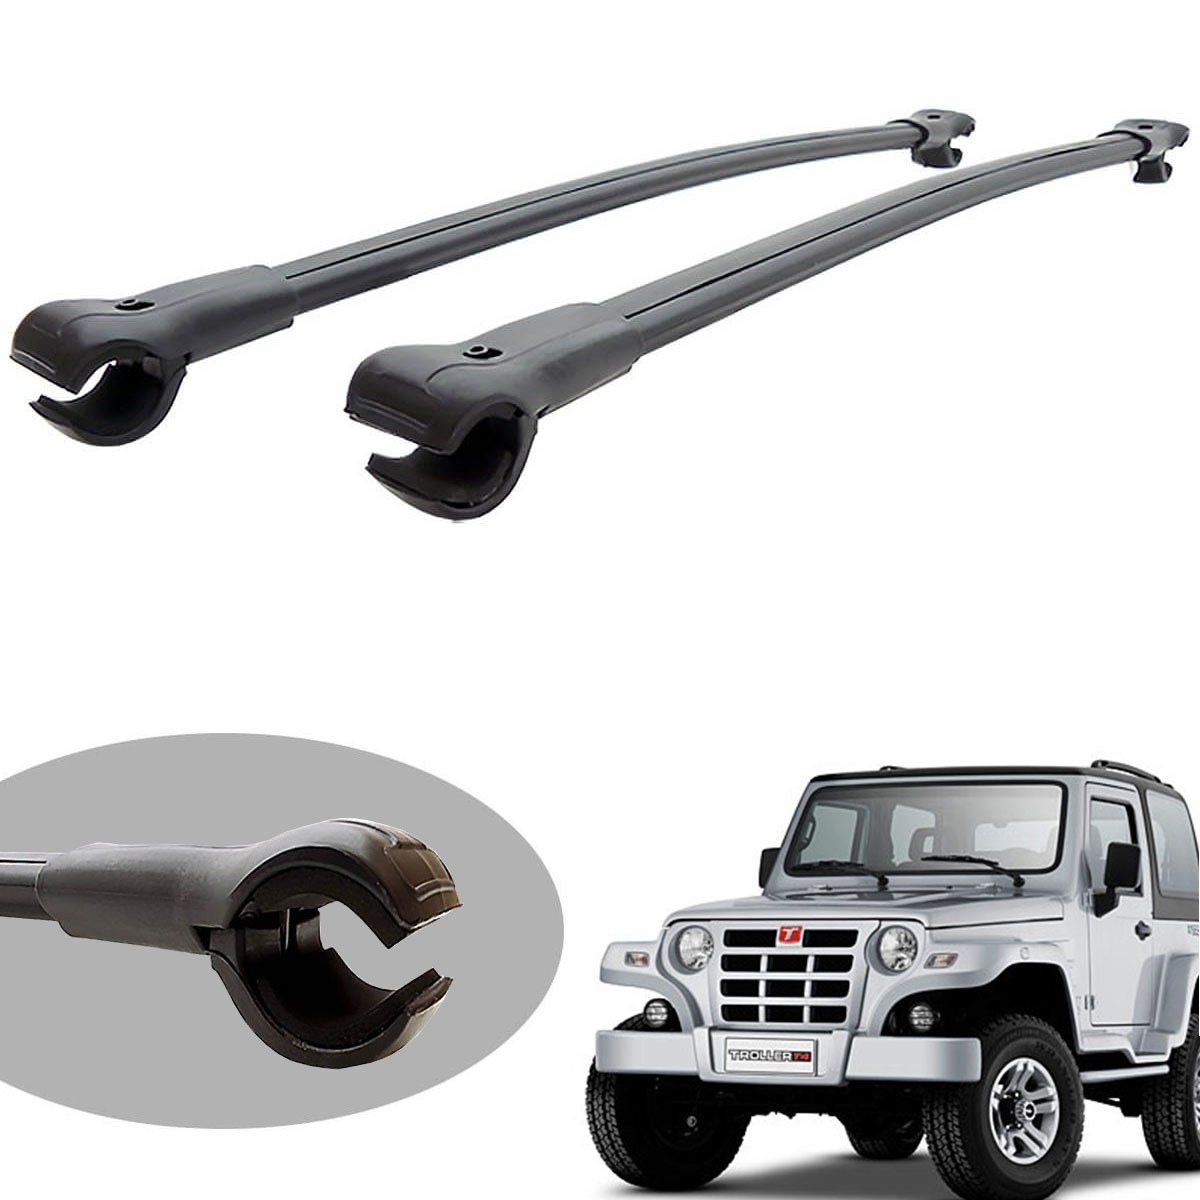 Travessa rack de teto larga preta alumínio Troller 2009 a 2014